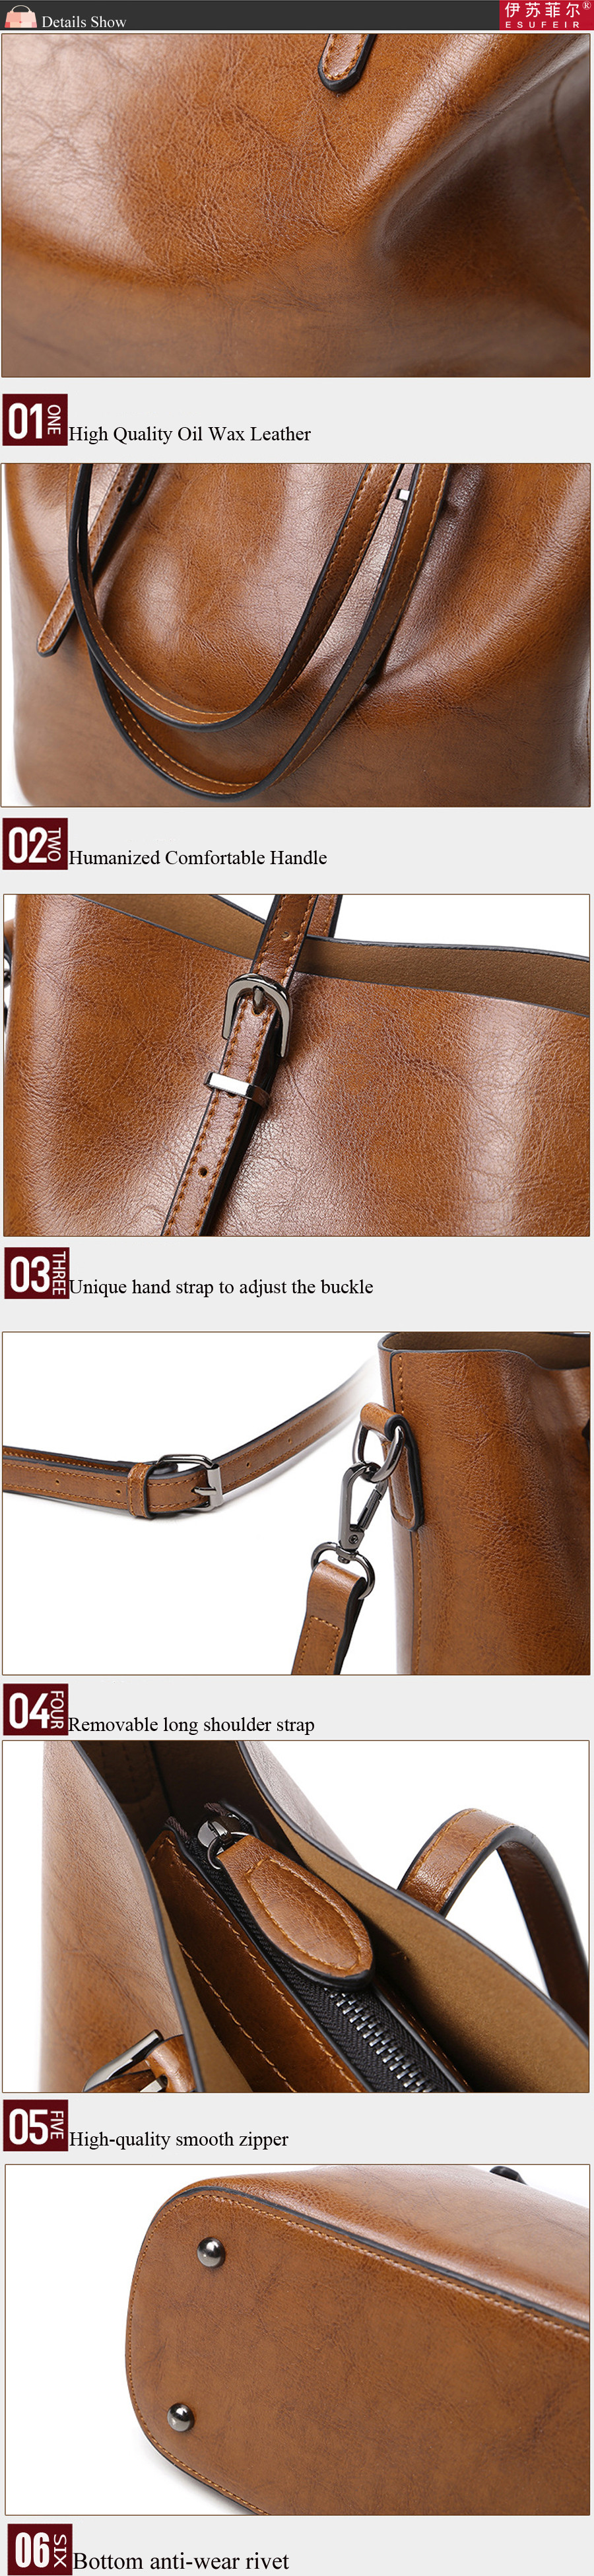 women-bag-12